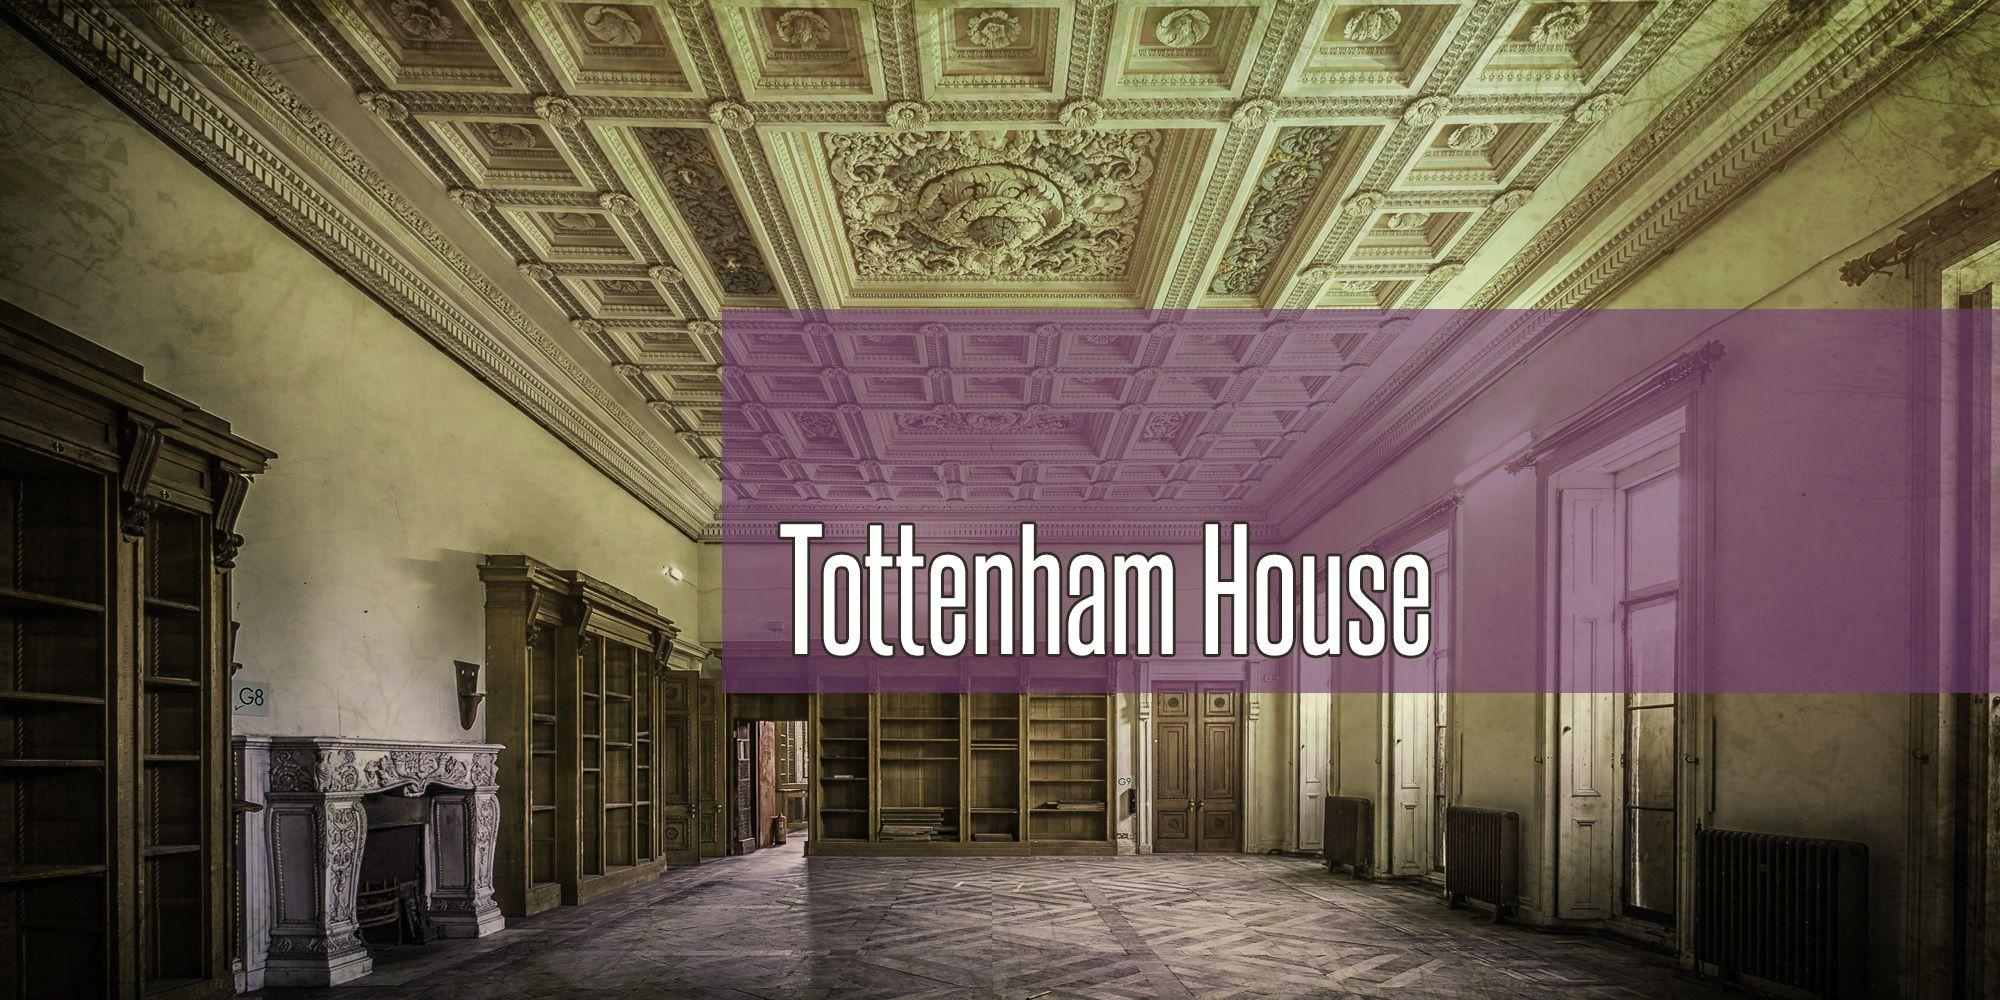 Tottenham House Wiltshire Uk Wiltshire House Tottenham